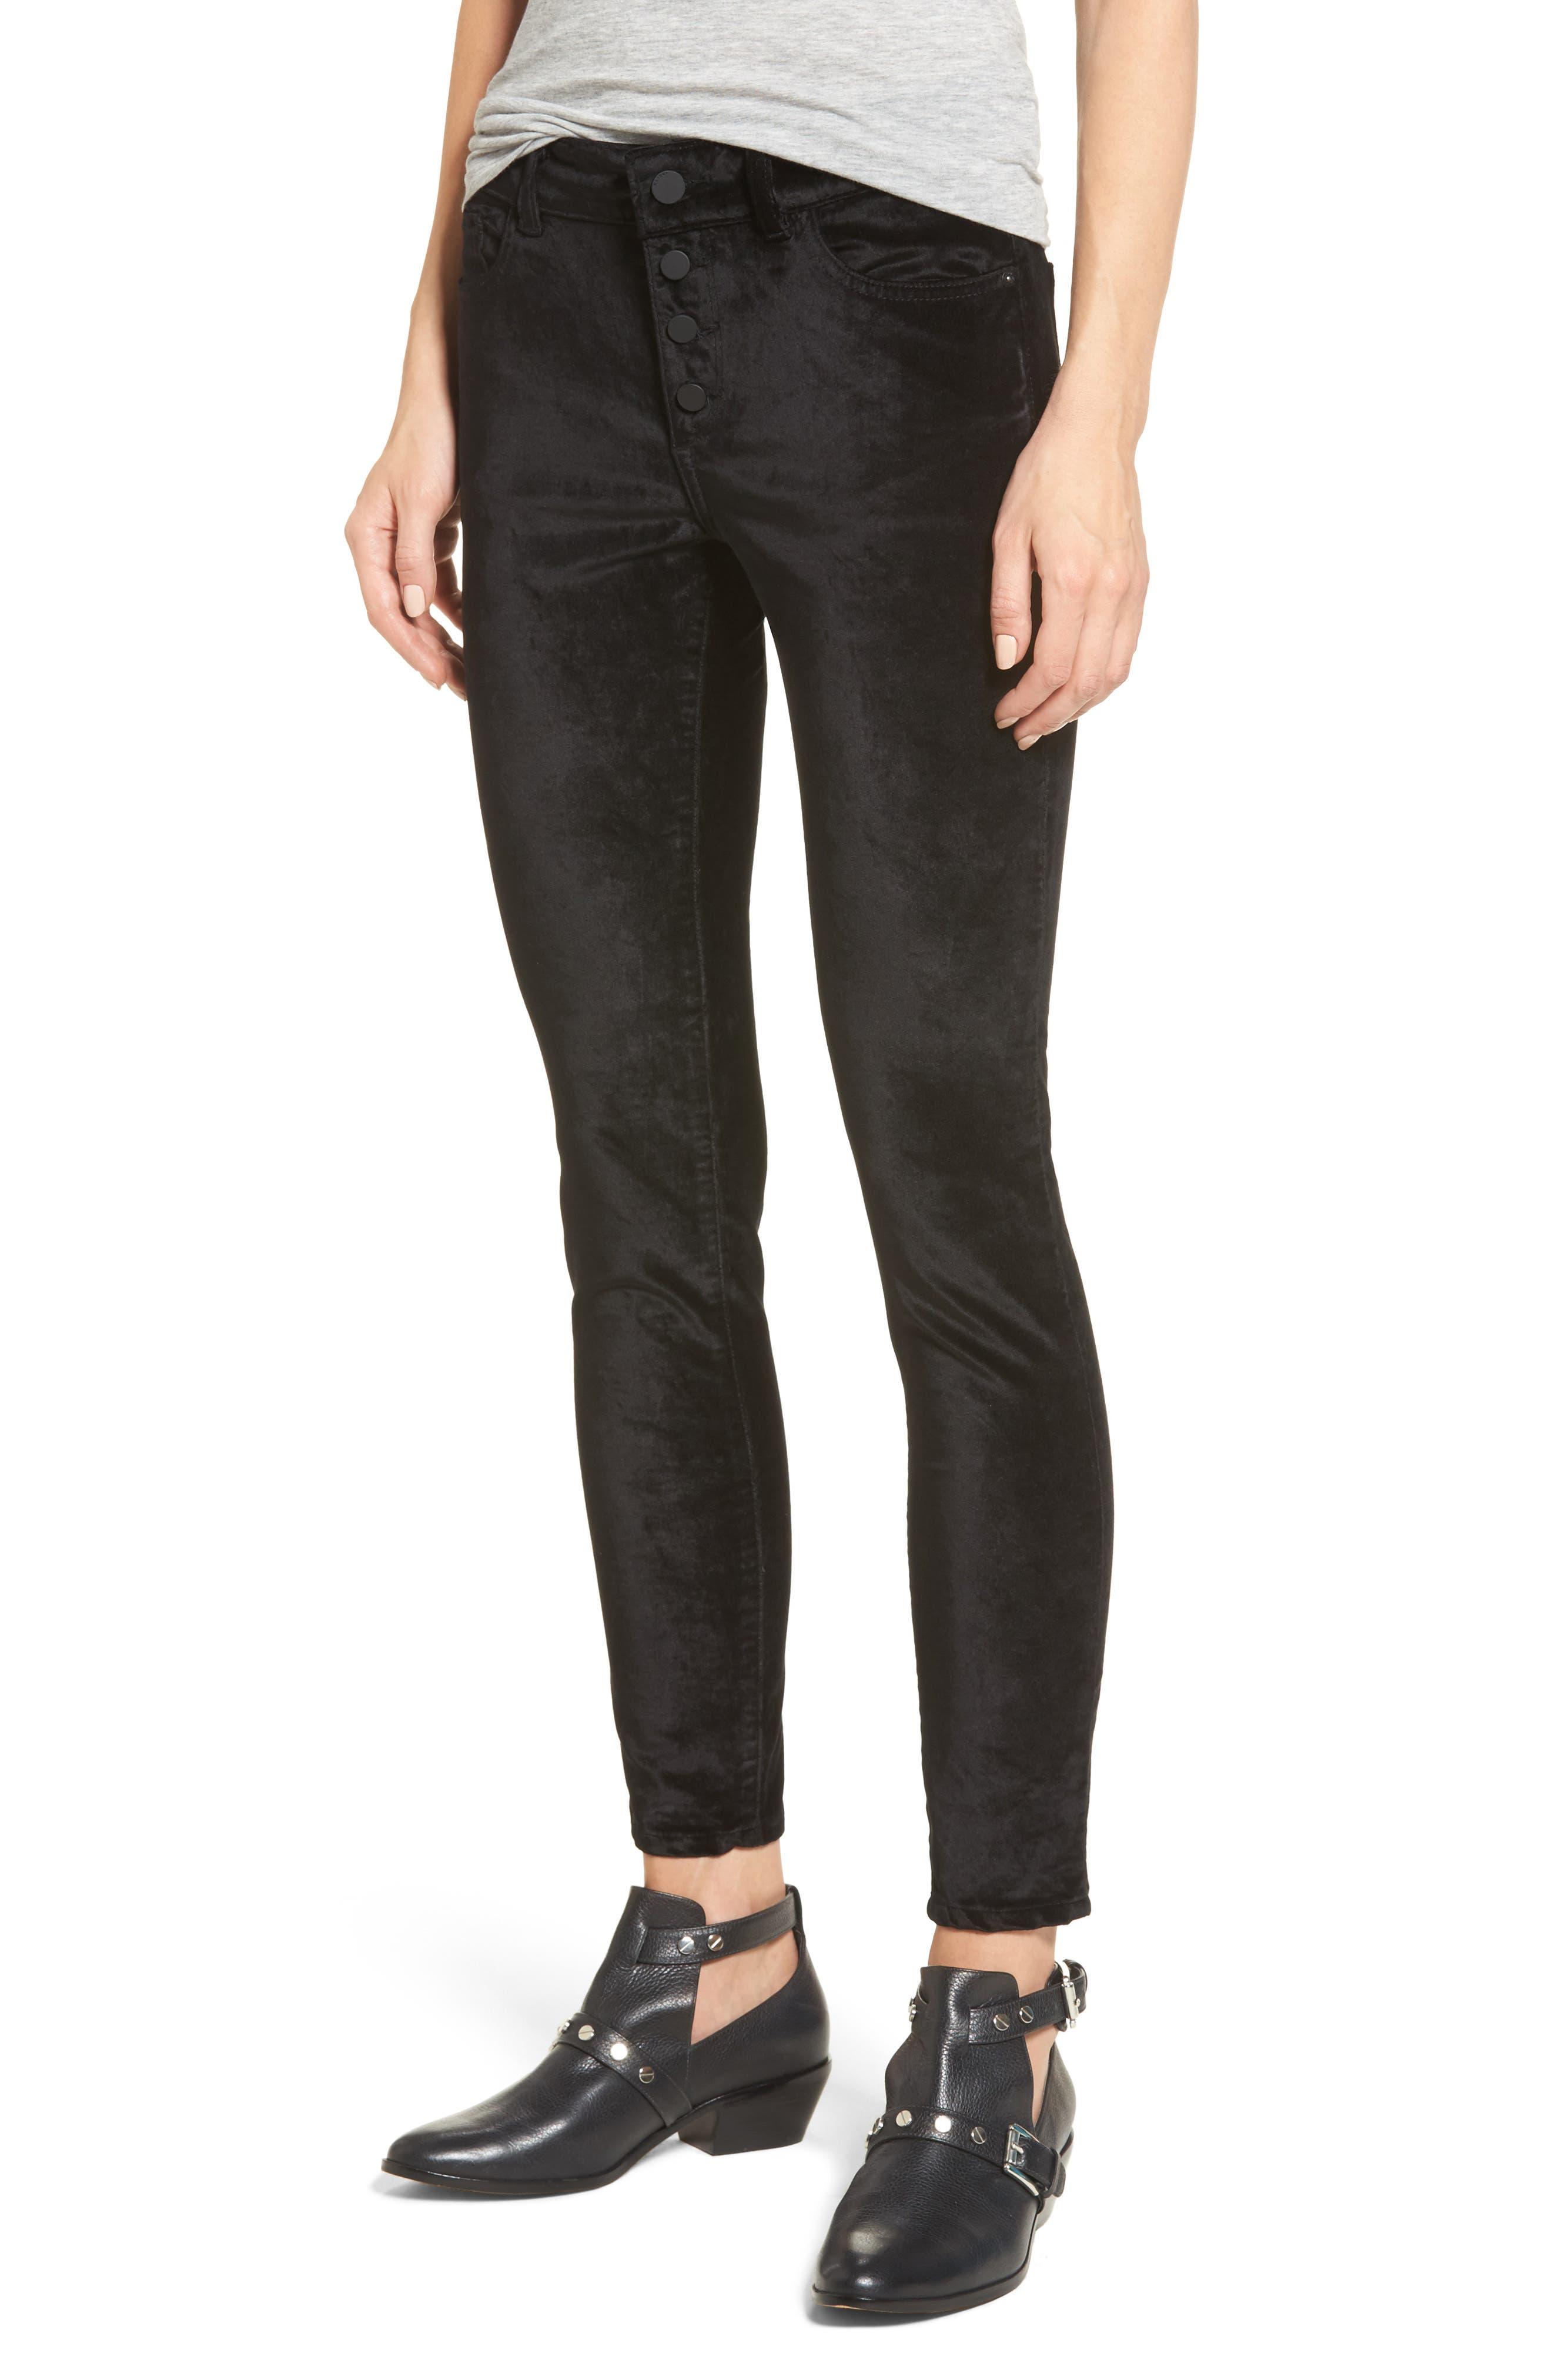 Emma Power Legging Jeans,                             Main thumbnail 1, color,                             001